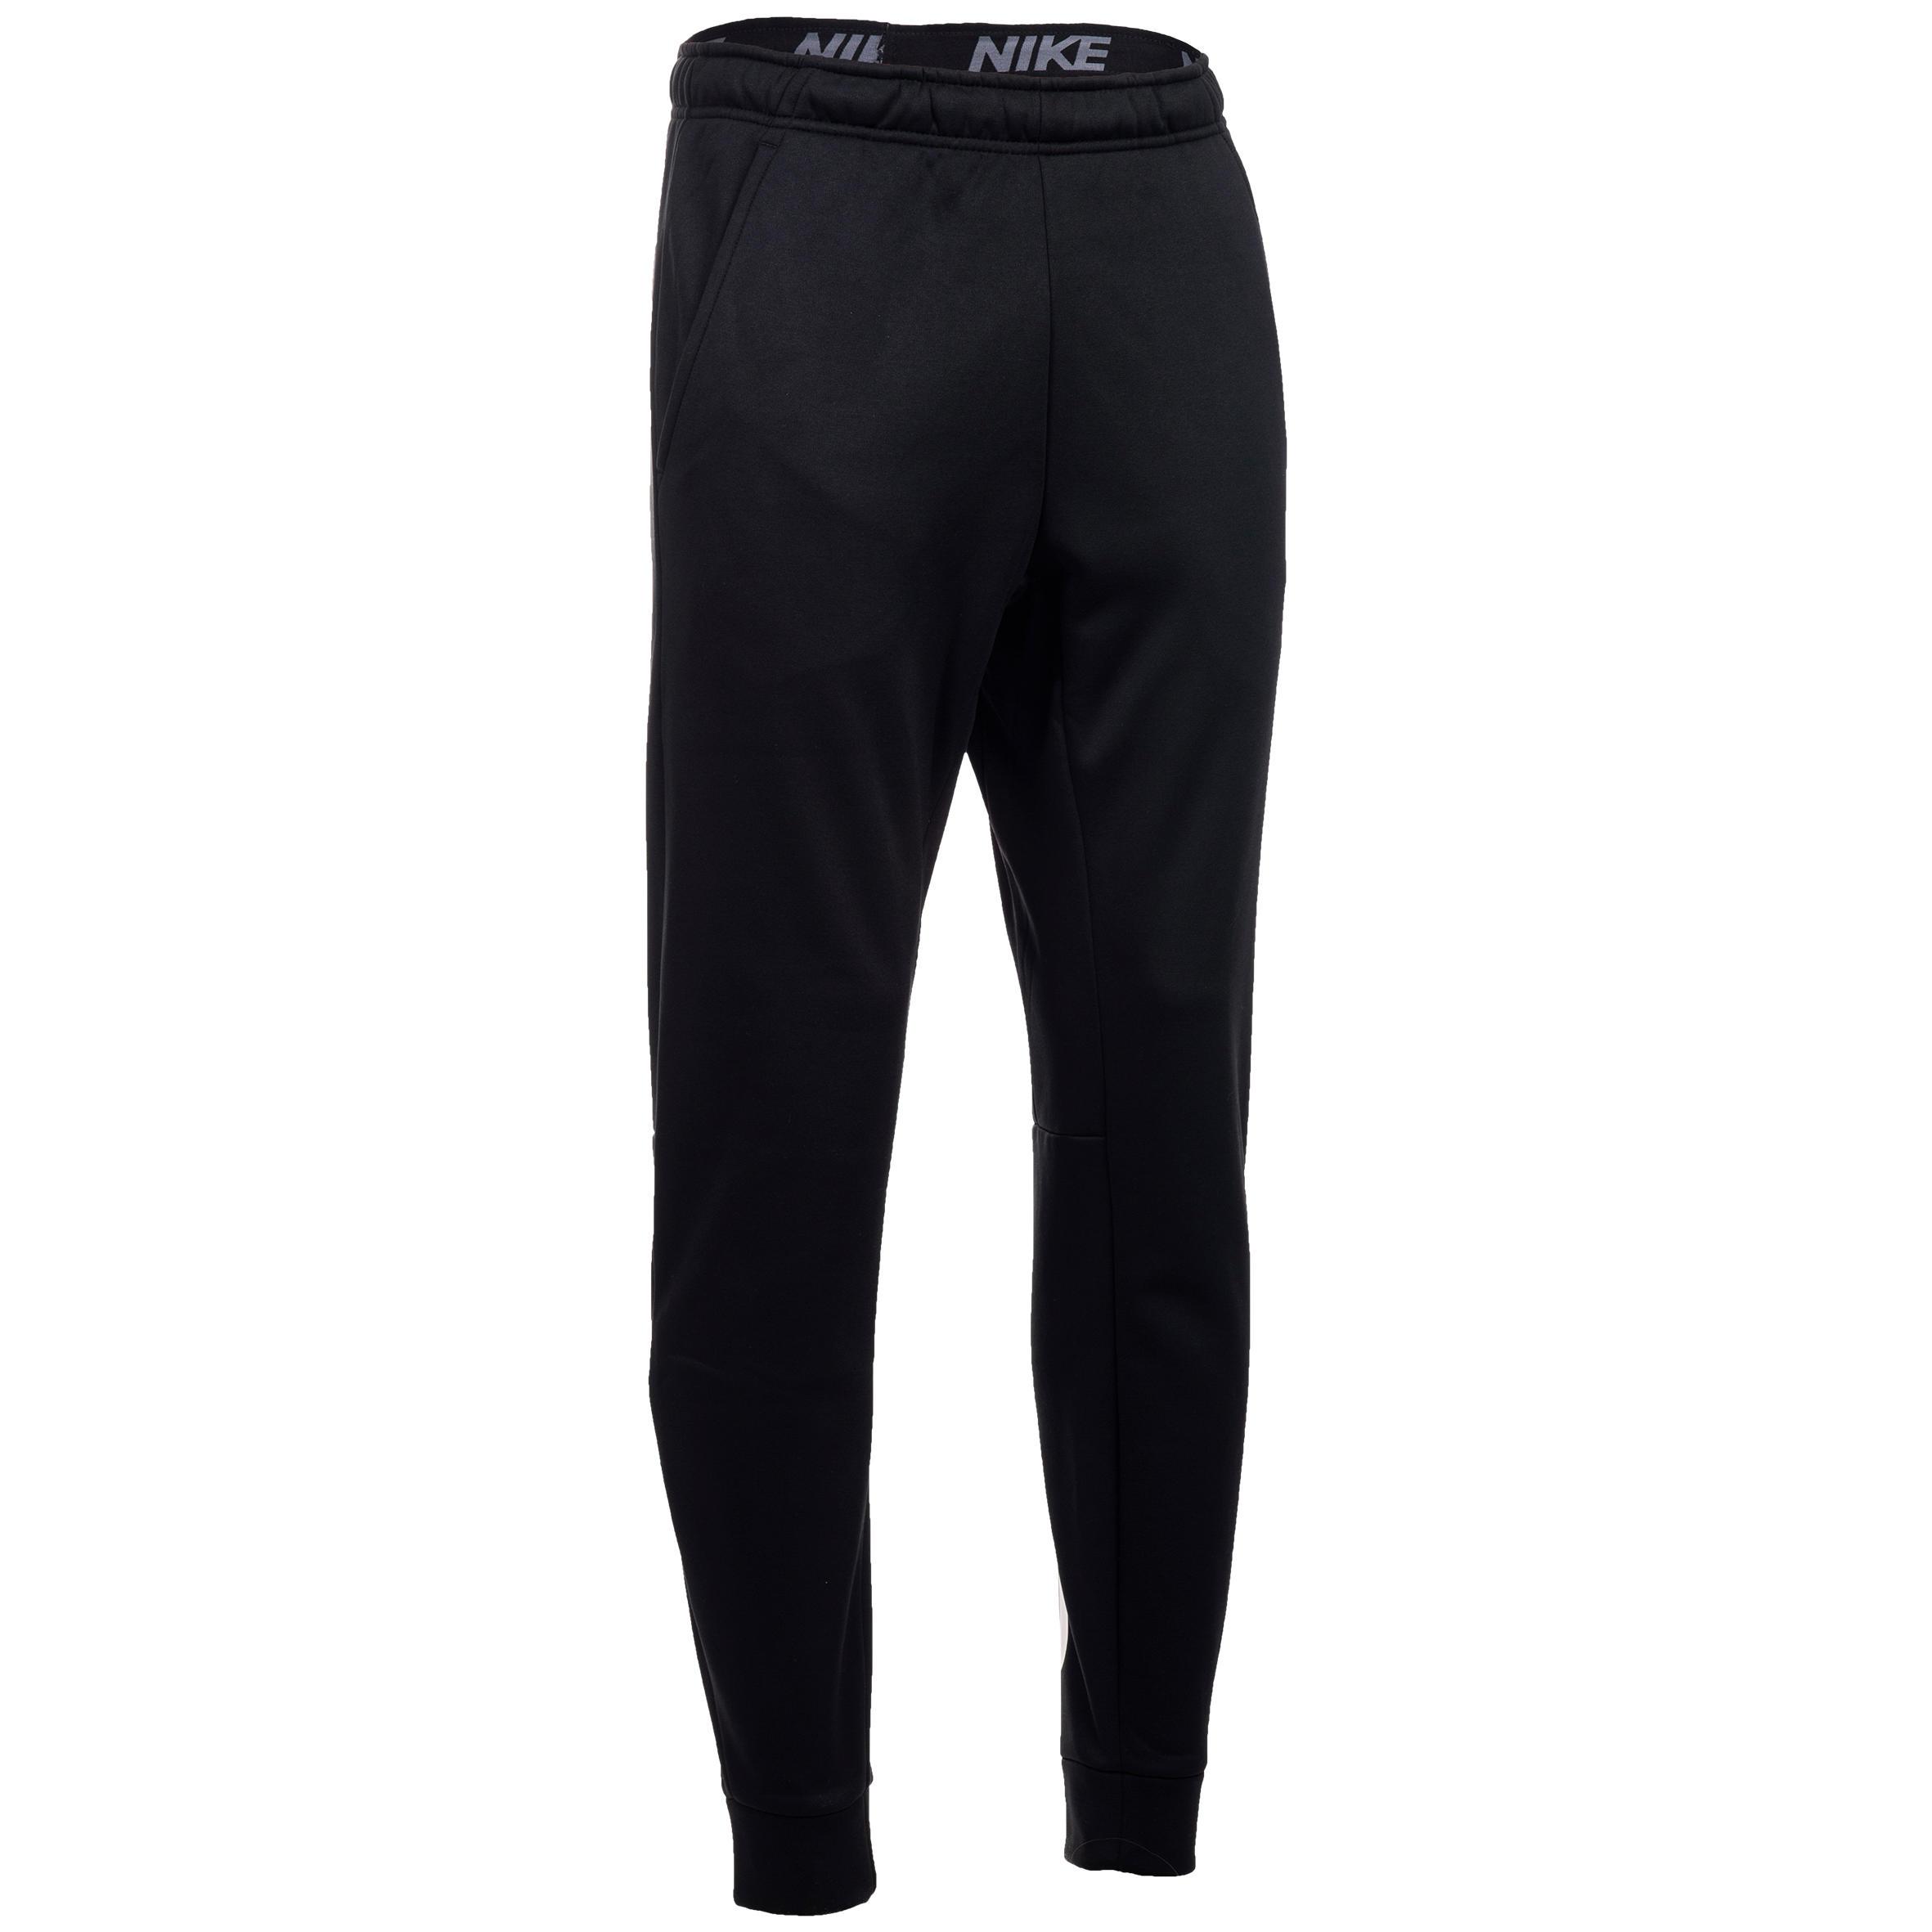 pantalon nike noir homme